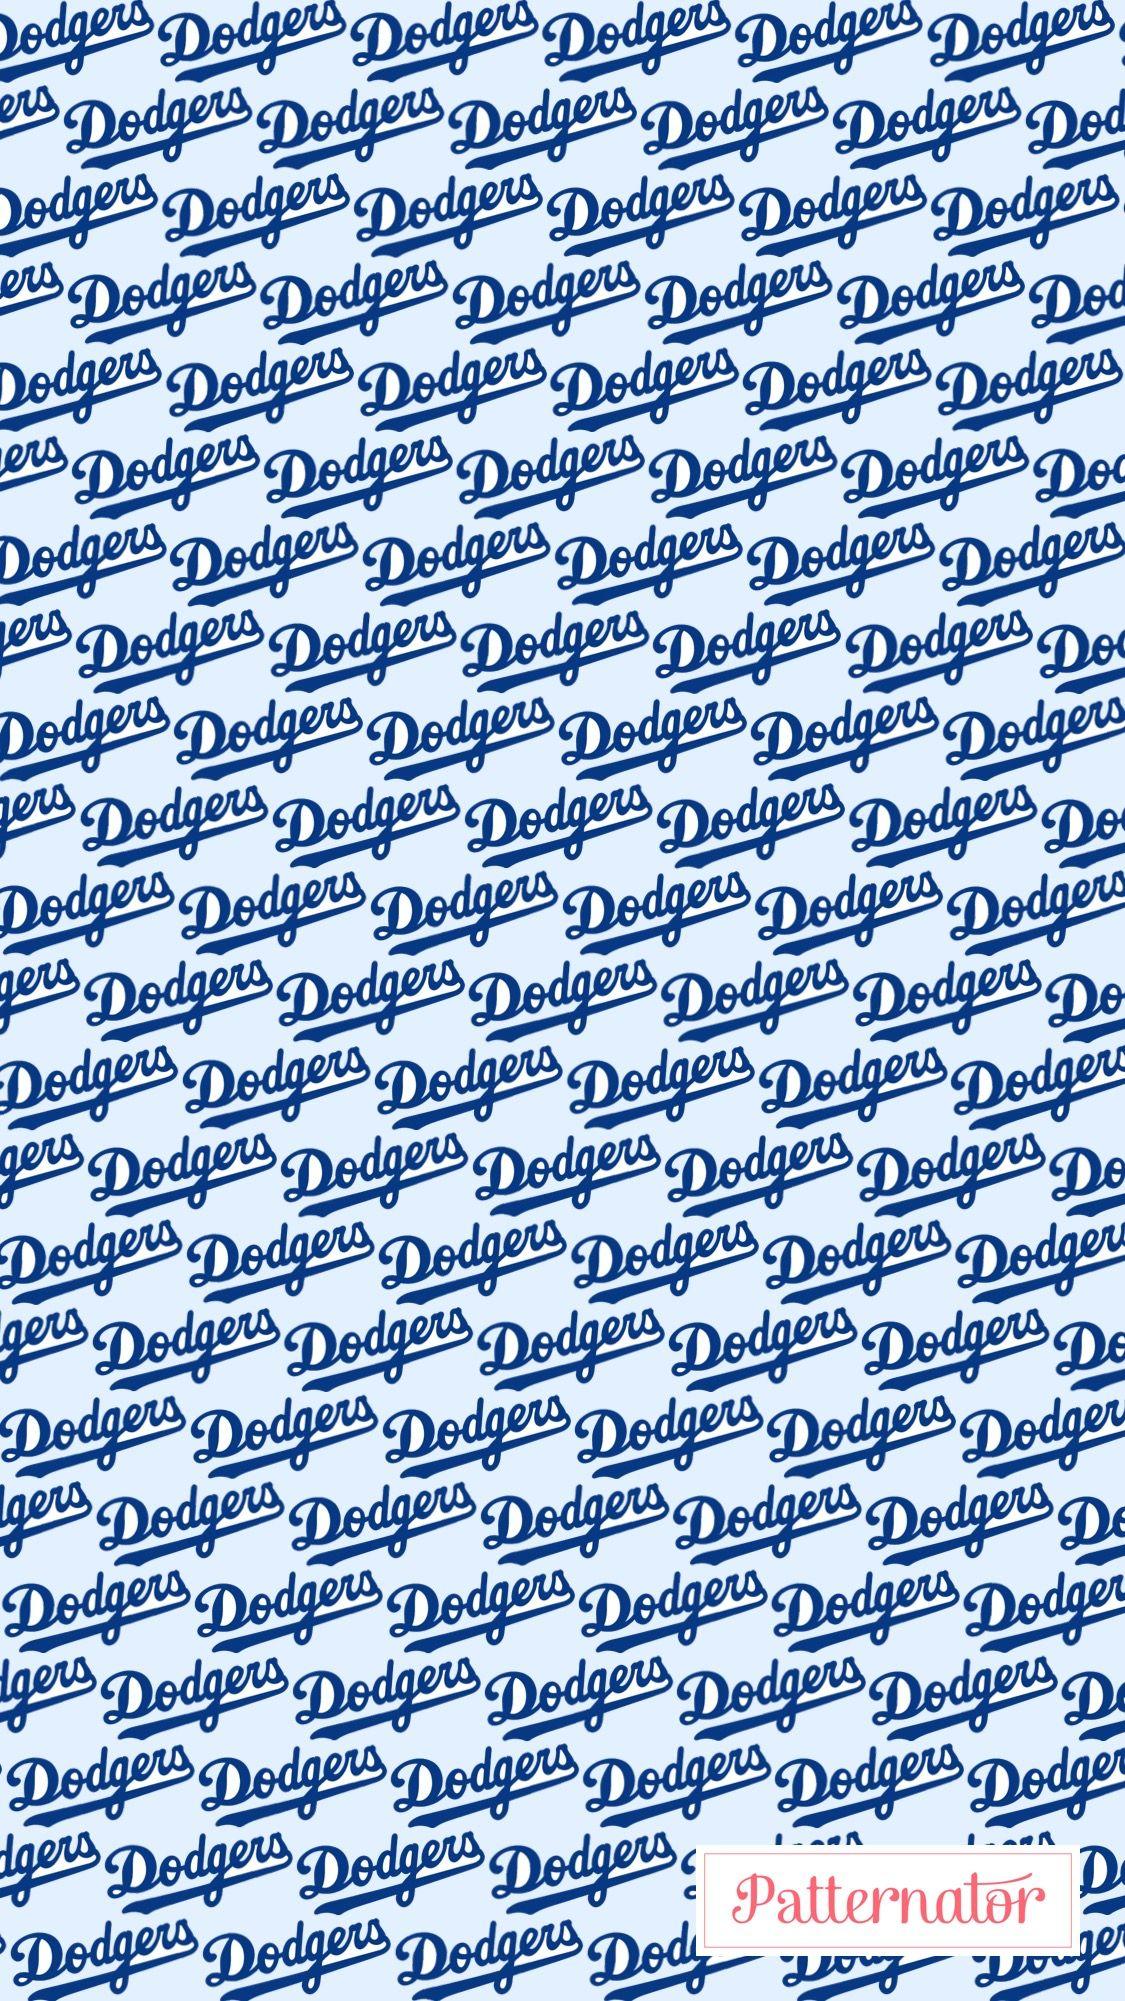 Pin de Faviola Lopez en Cellphone wallpaper Dodgers de